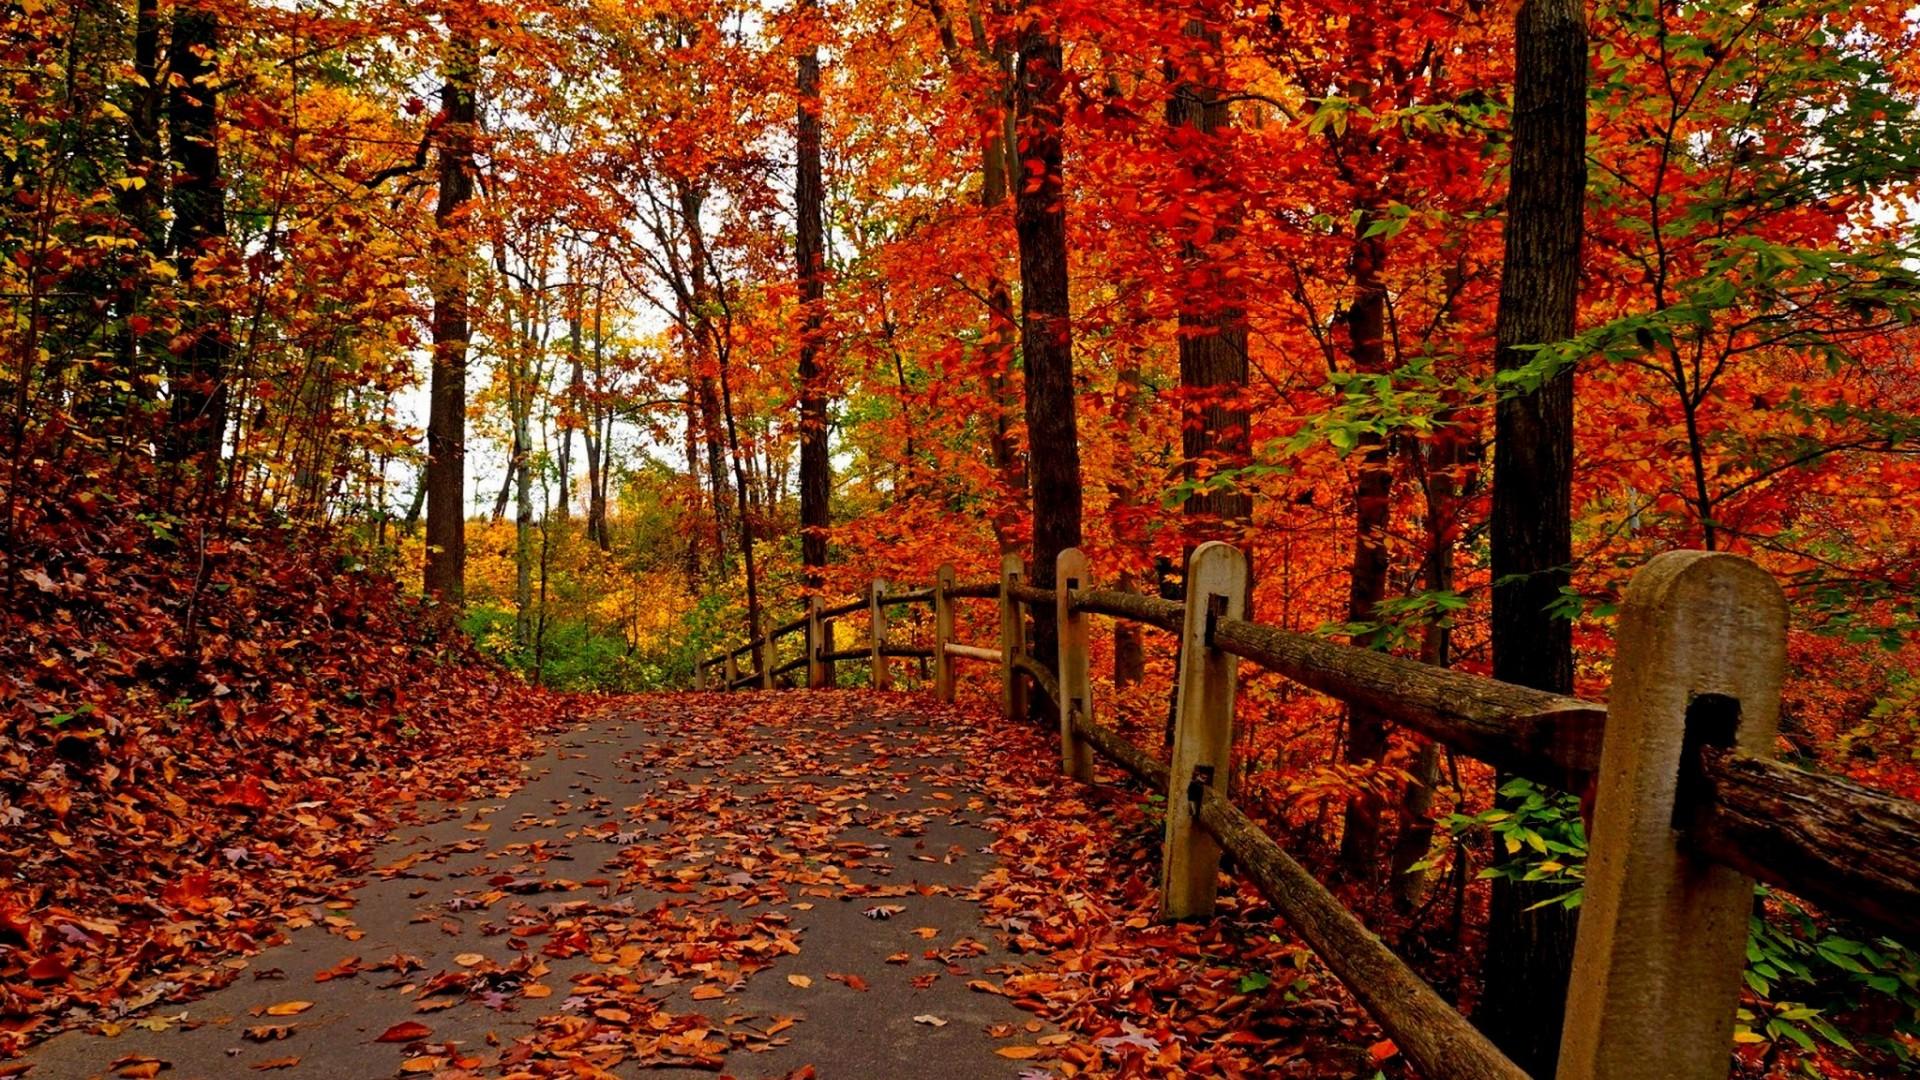 HD Autumn Beauty Way Wallpapers - HD Wallpapers - Desktop ...